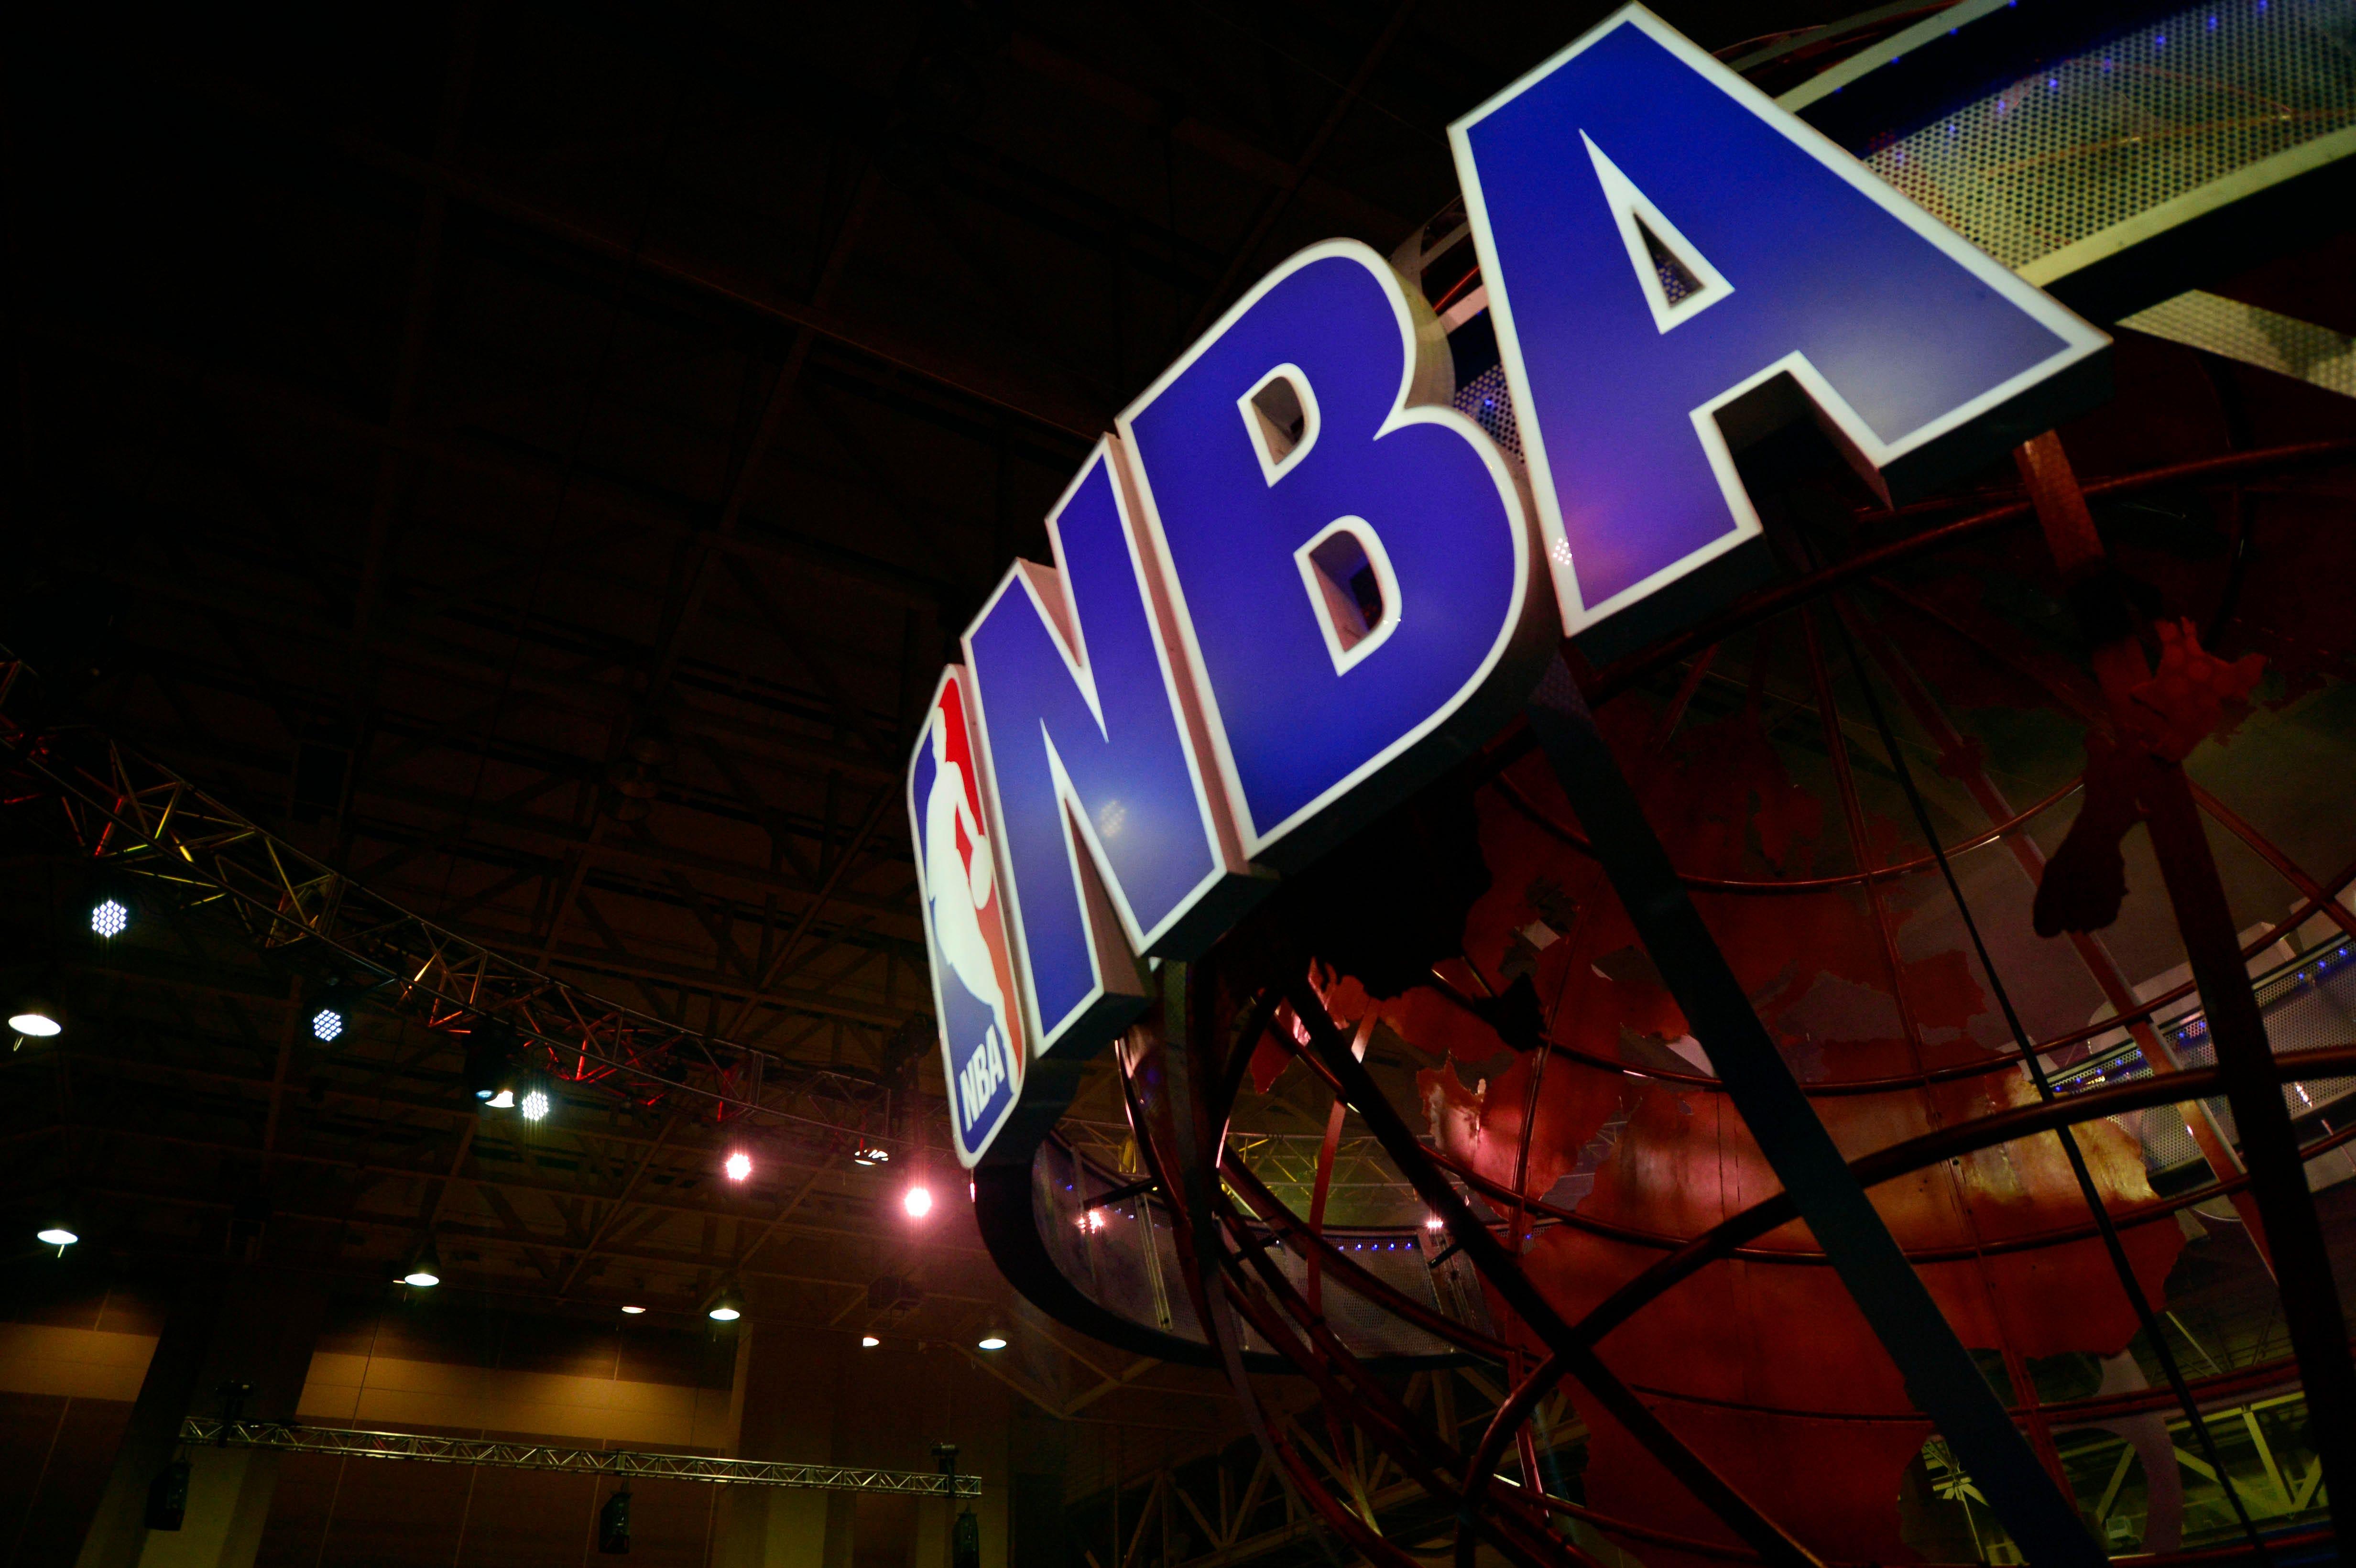 NBA Launchpad initiative seeks to improve basketball through emerging technologies